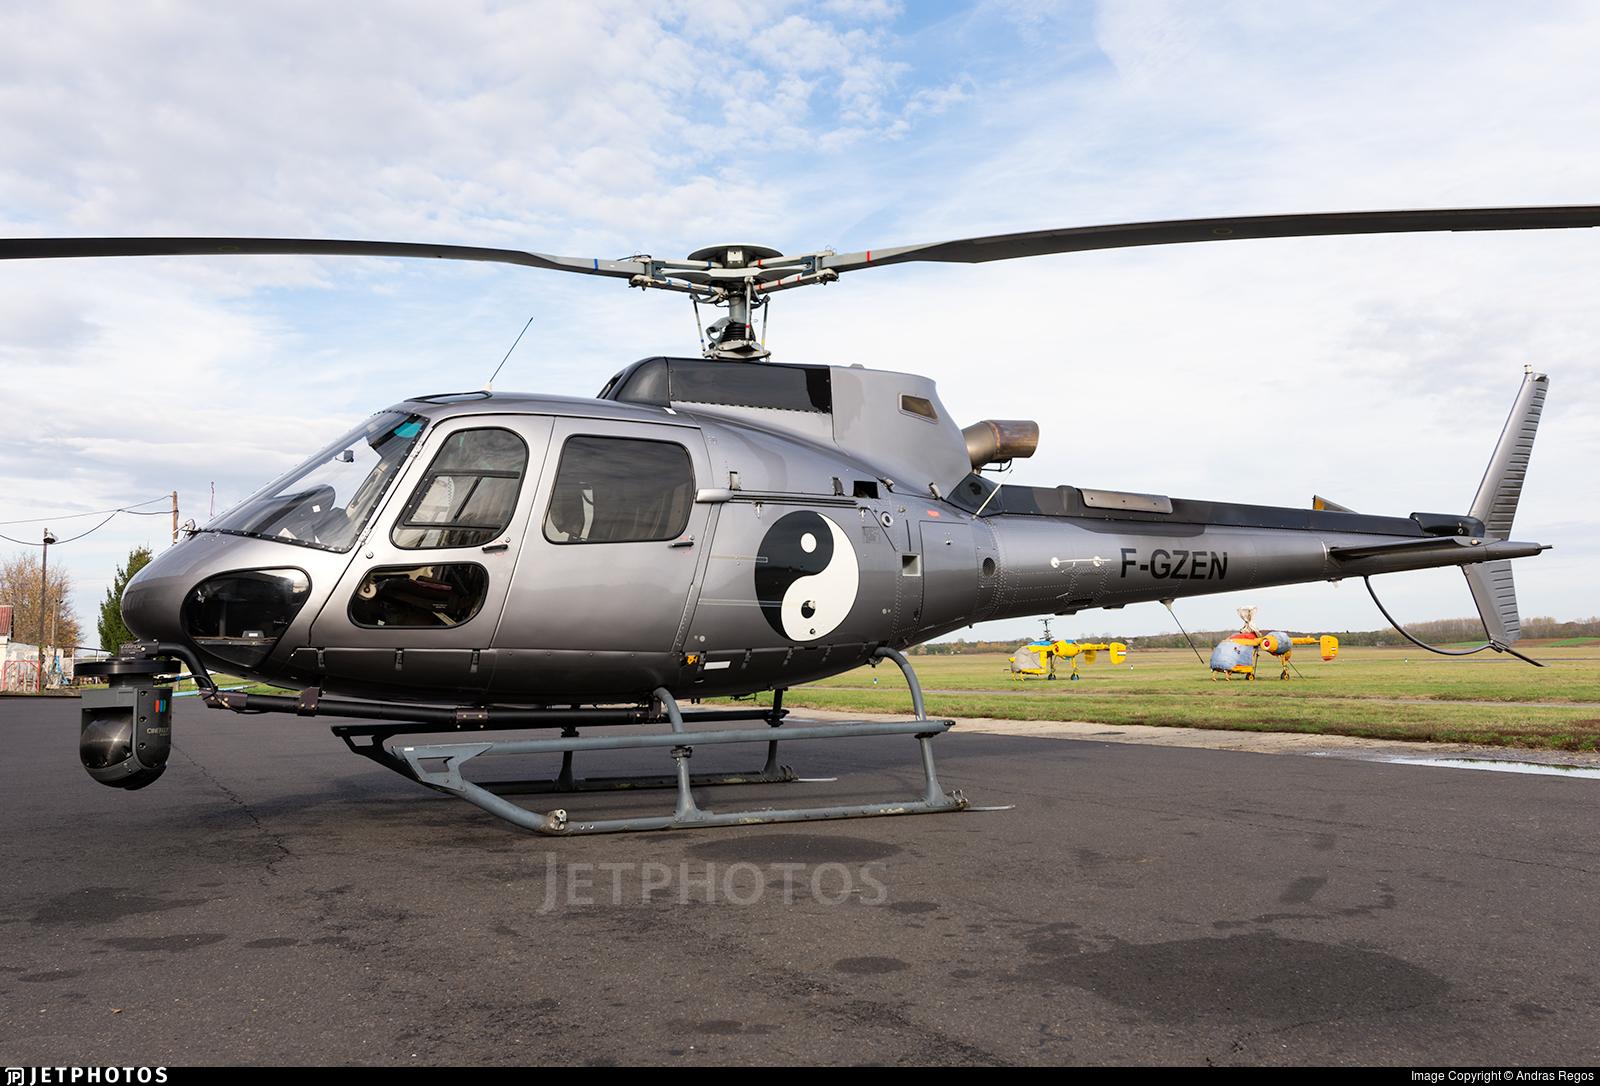 F-GZEN - Eurocopter AS 350B3 Ecureuil - Private